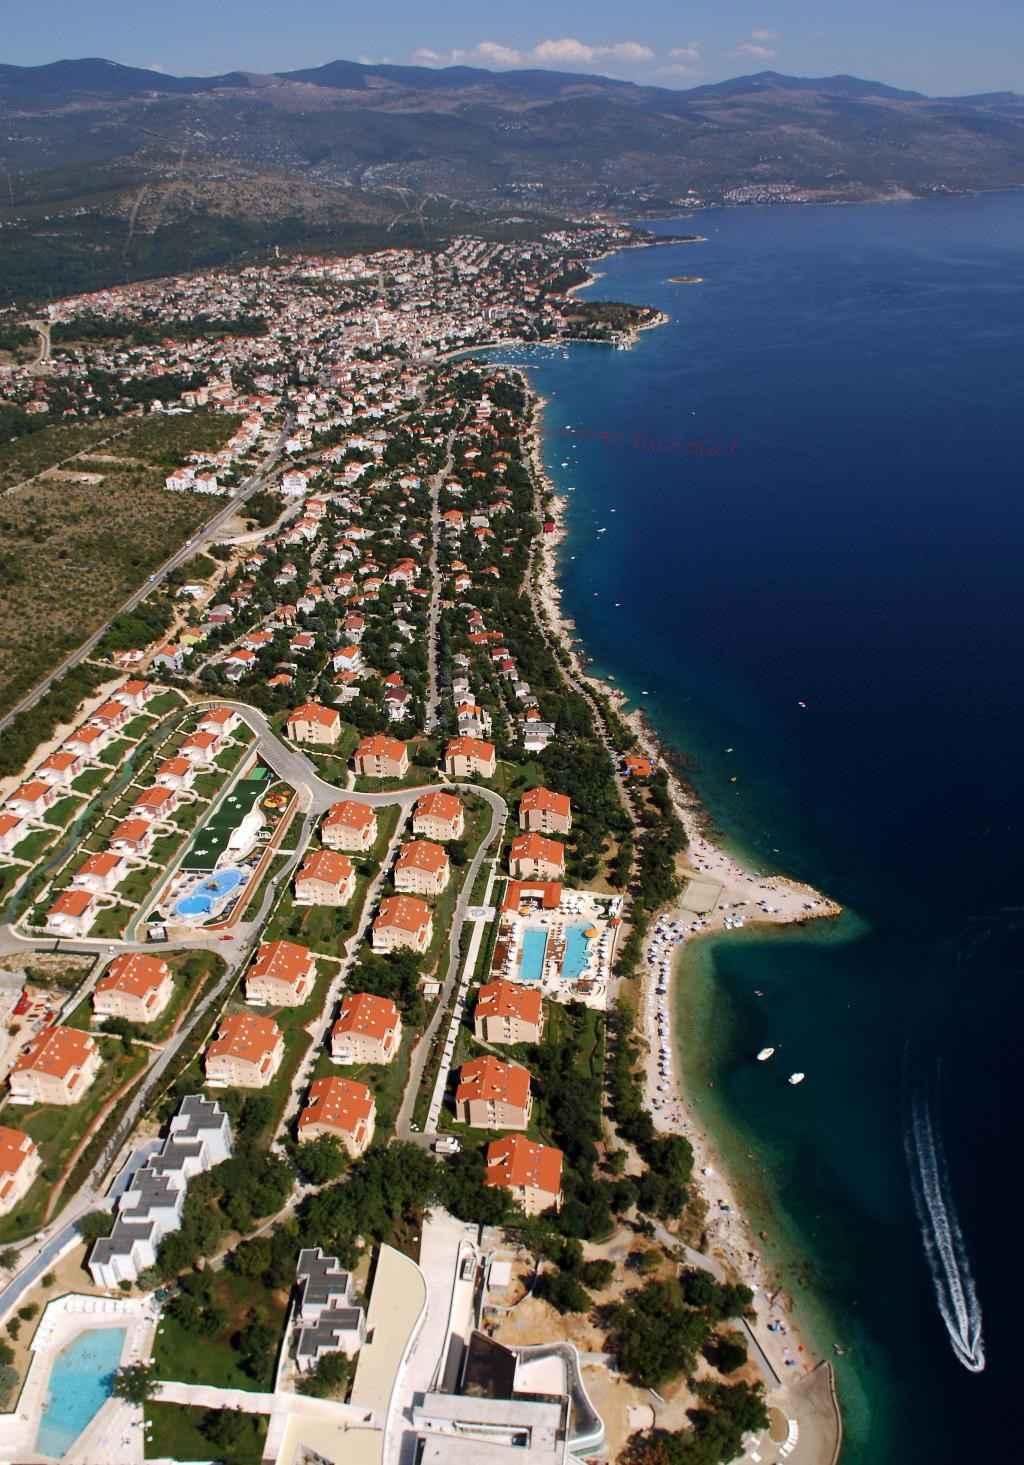 Appartement de vacances nahe von Meer, WI-FI, Klima (2182509), Novi Vinodolski, , Kvarner, Croatie, image 8